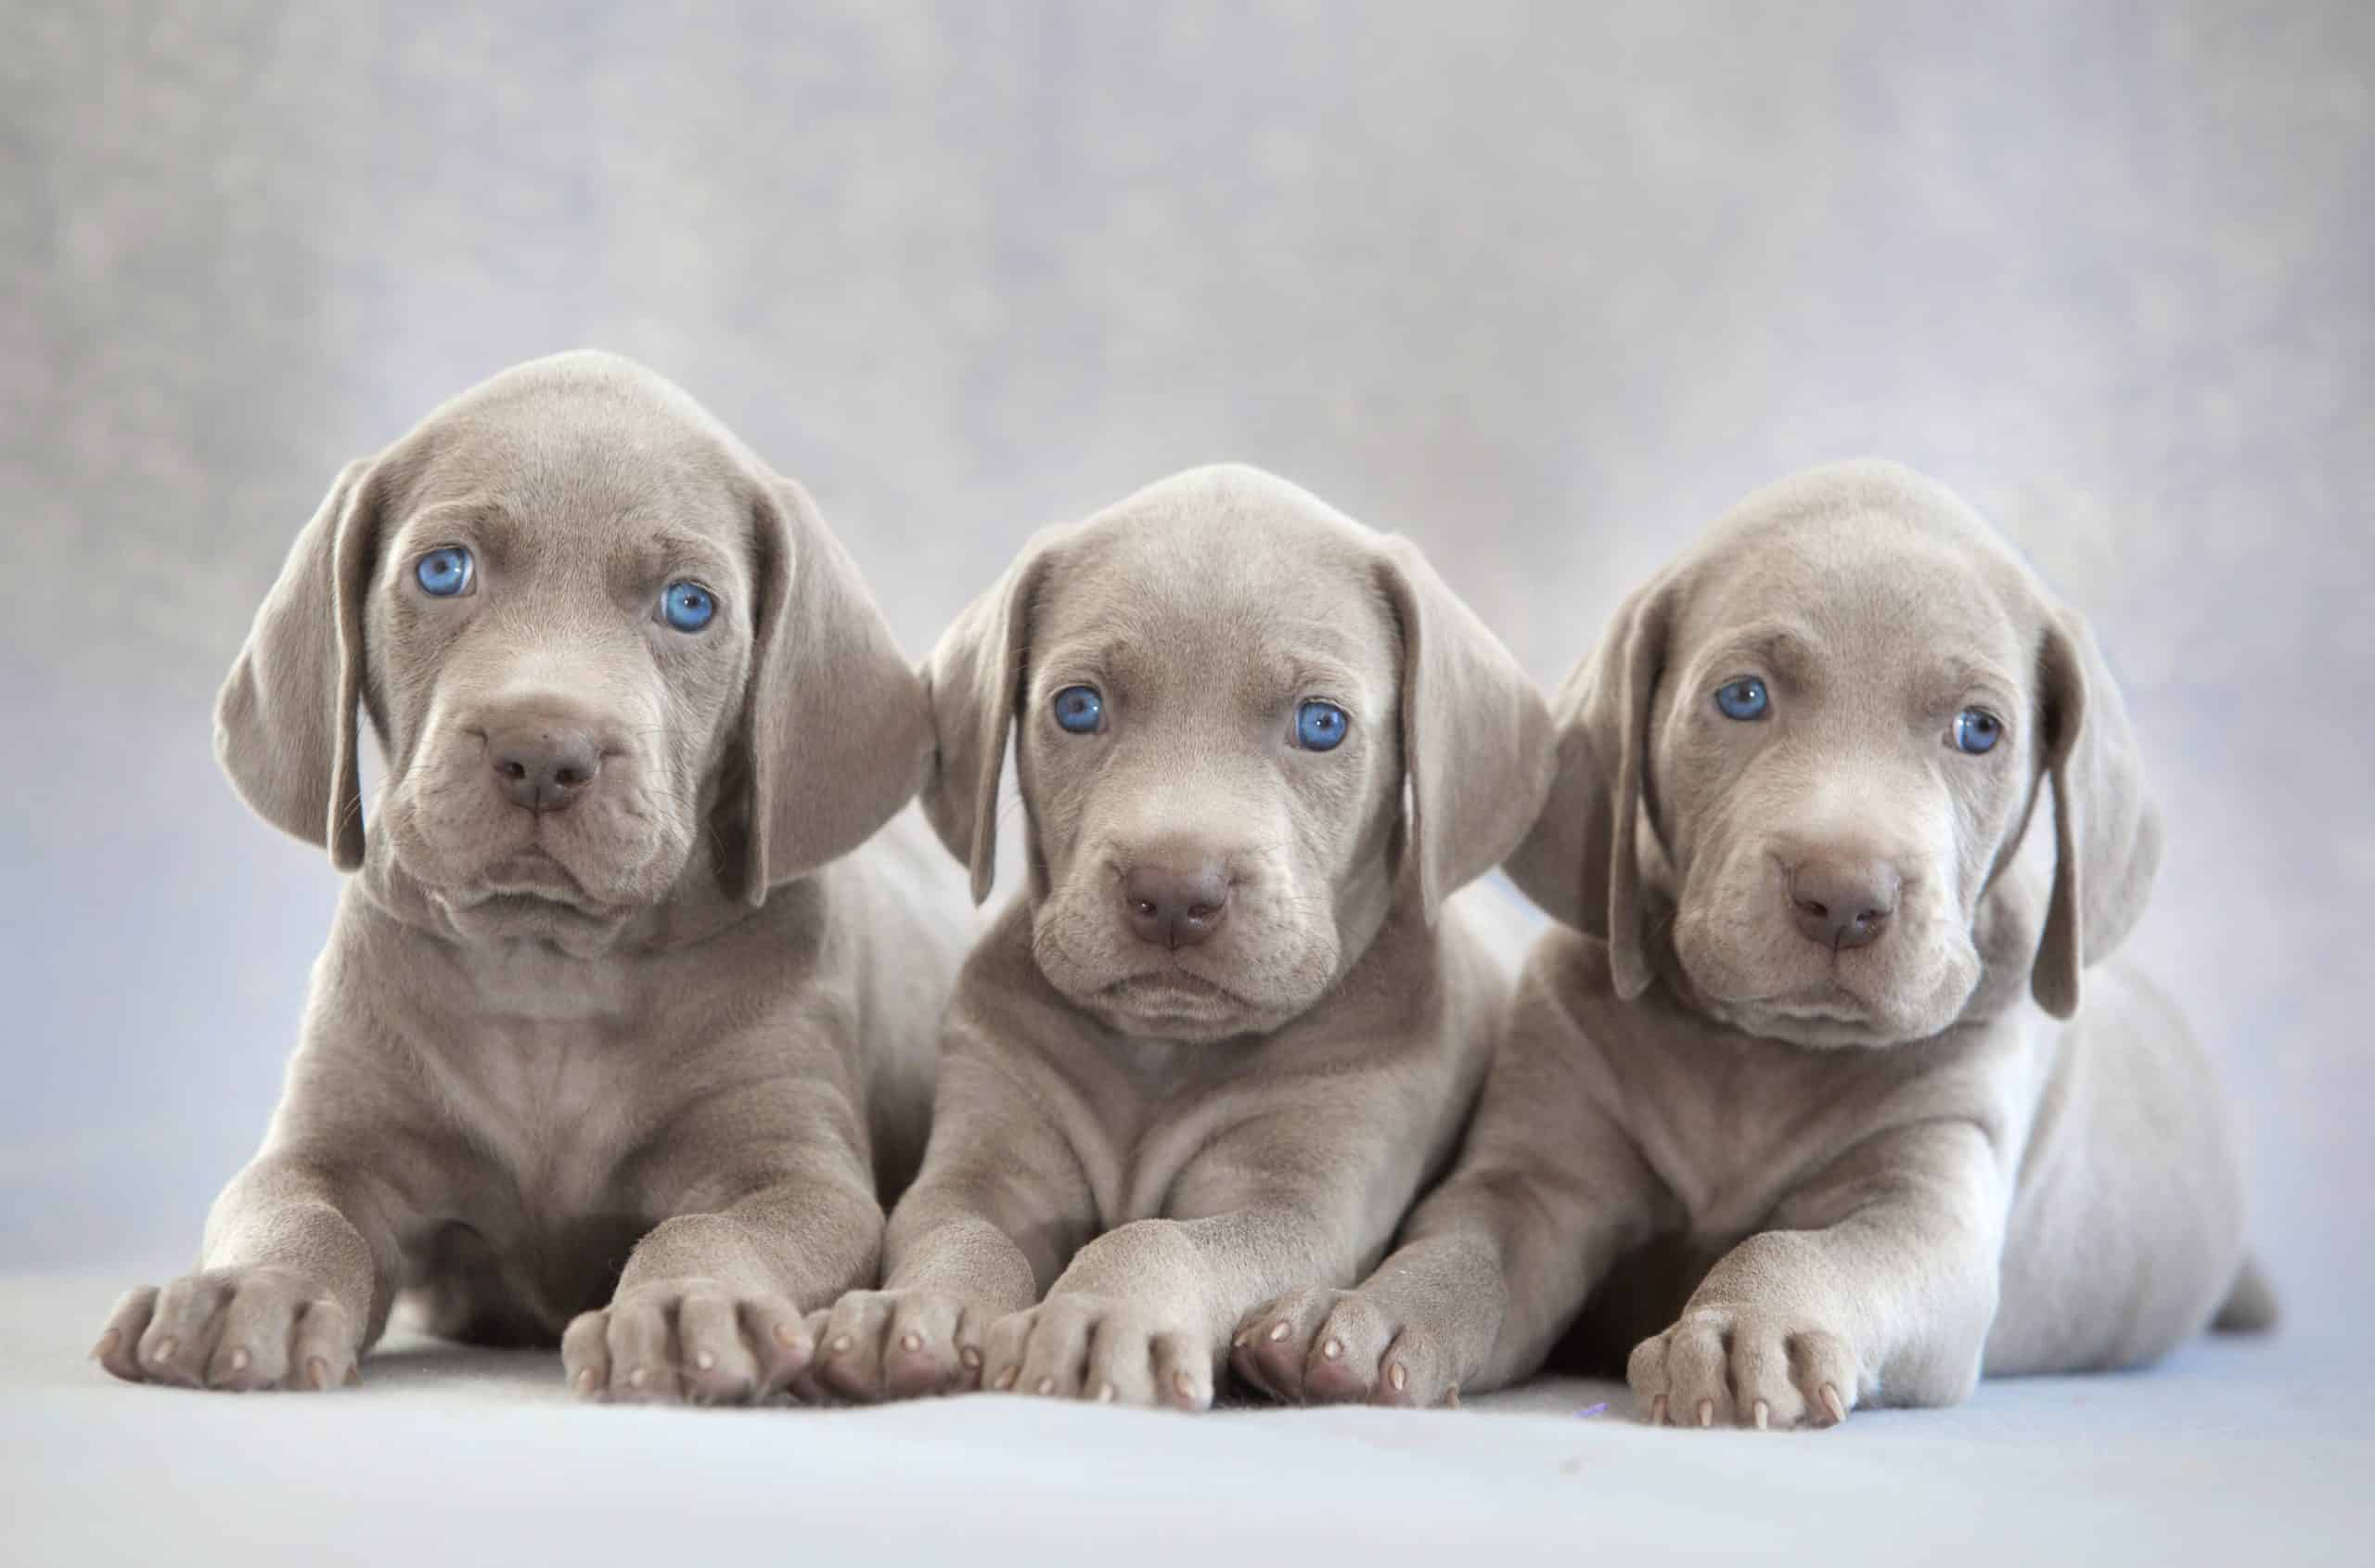 Trio of Weimaraner puppies with bright blue eyes.